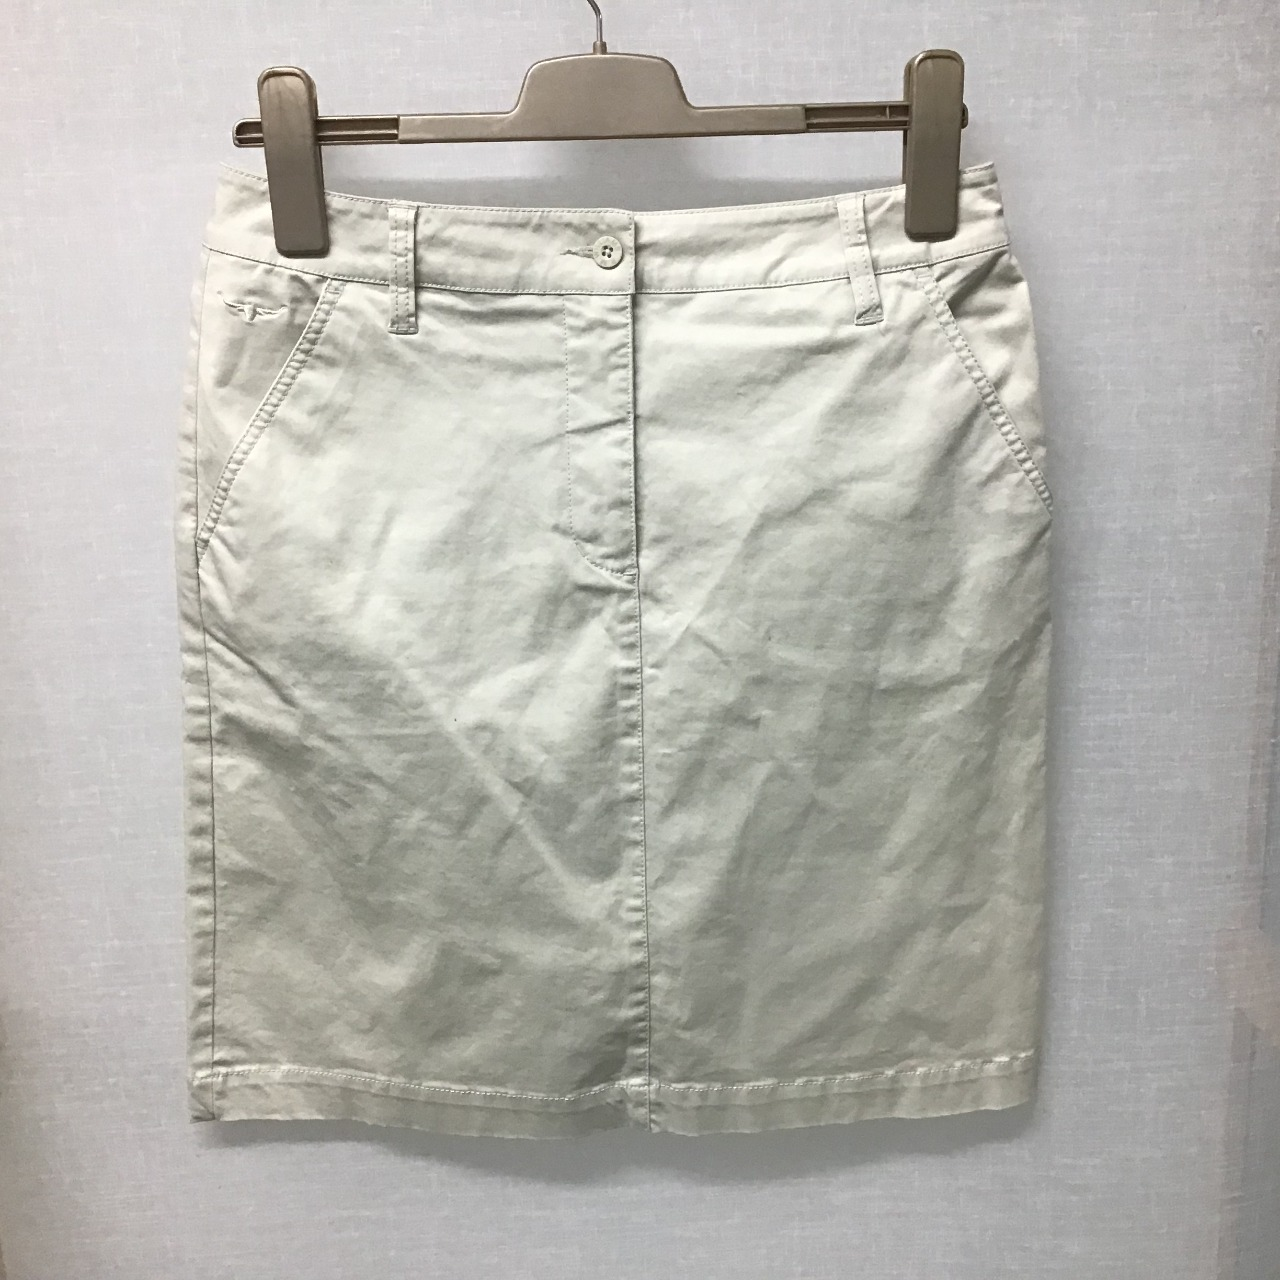 R.M. Williams, Beige skirt, Size 10 - 12